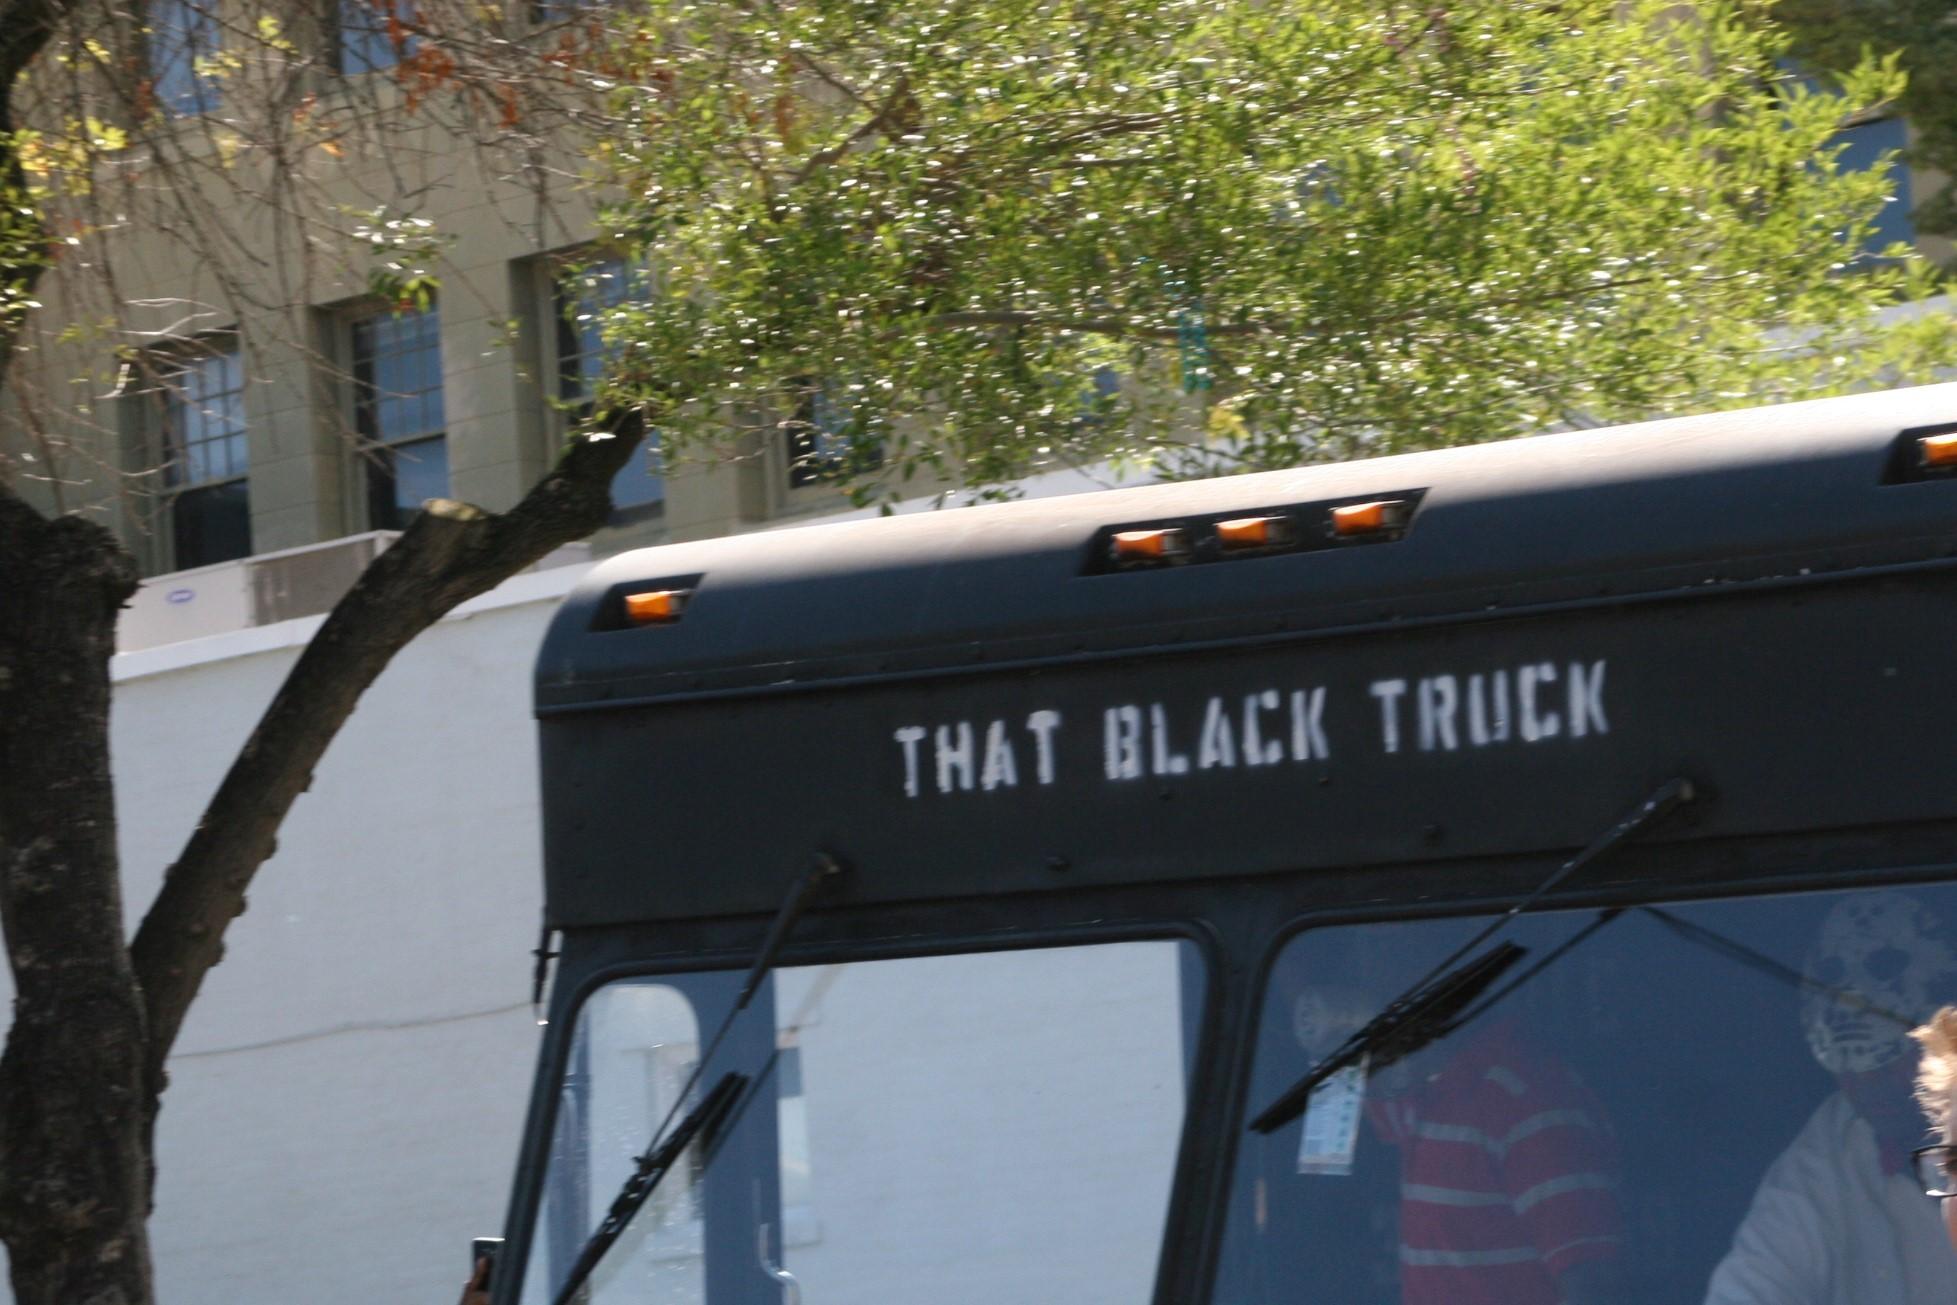 BLacktruck3.jpg